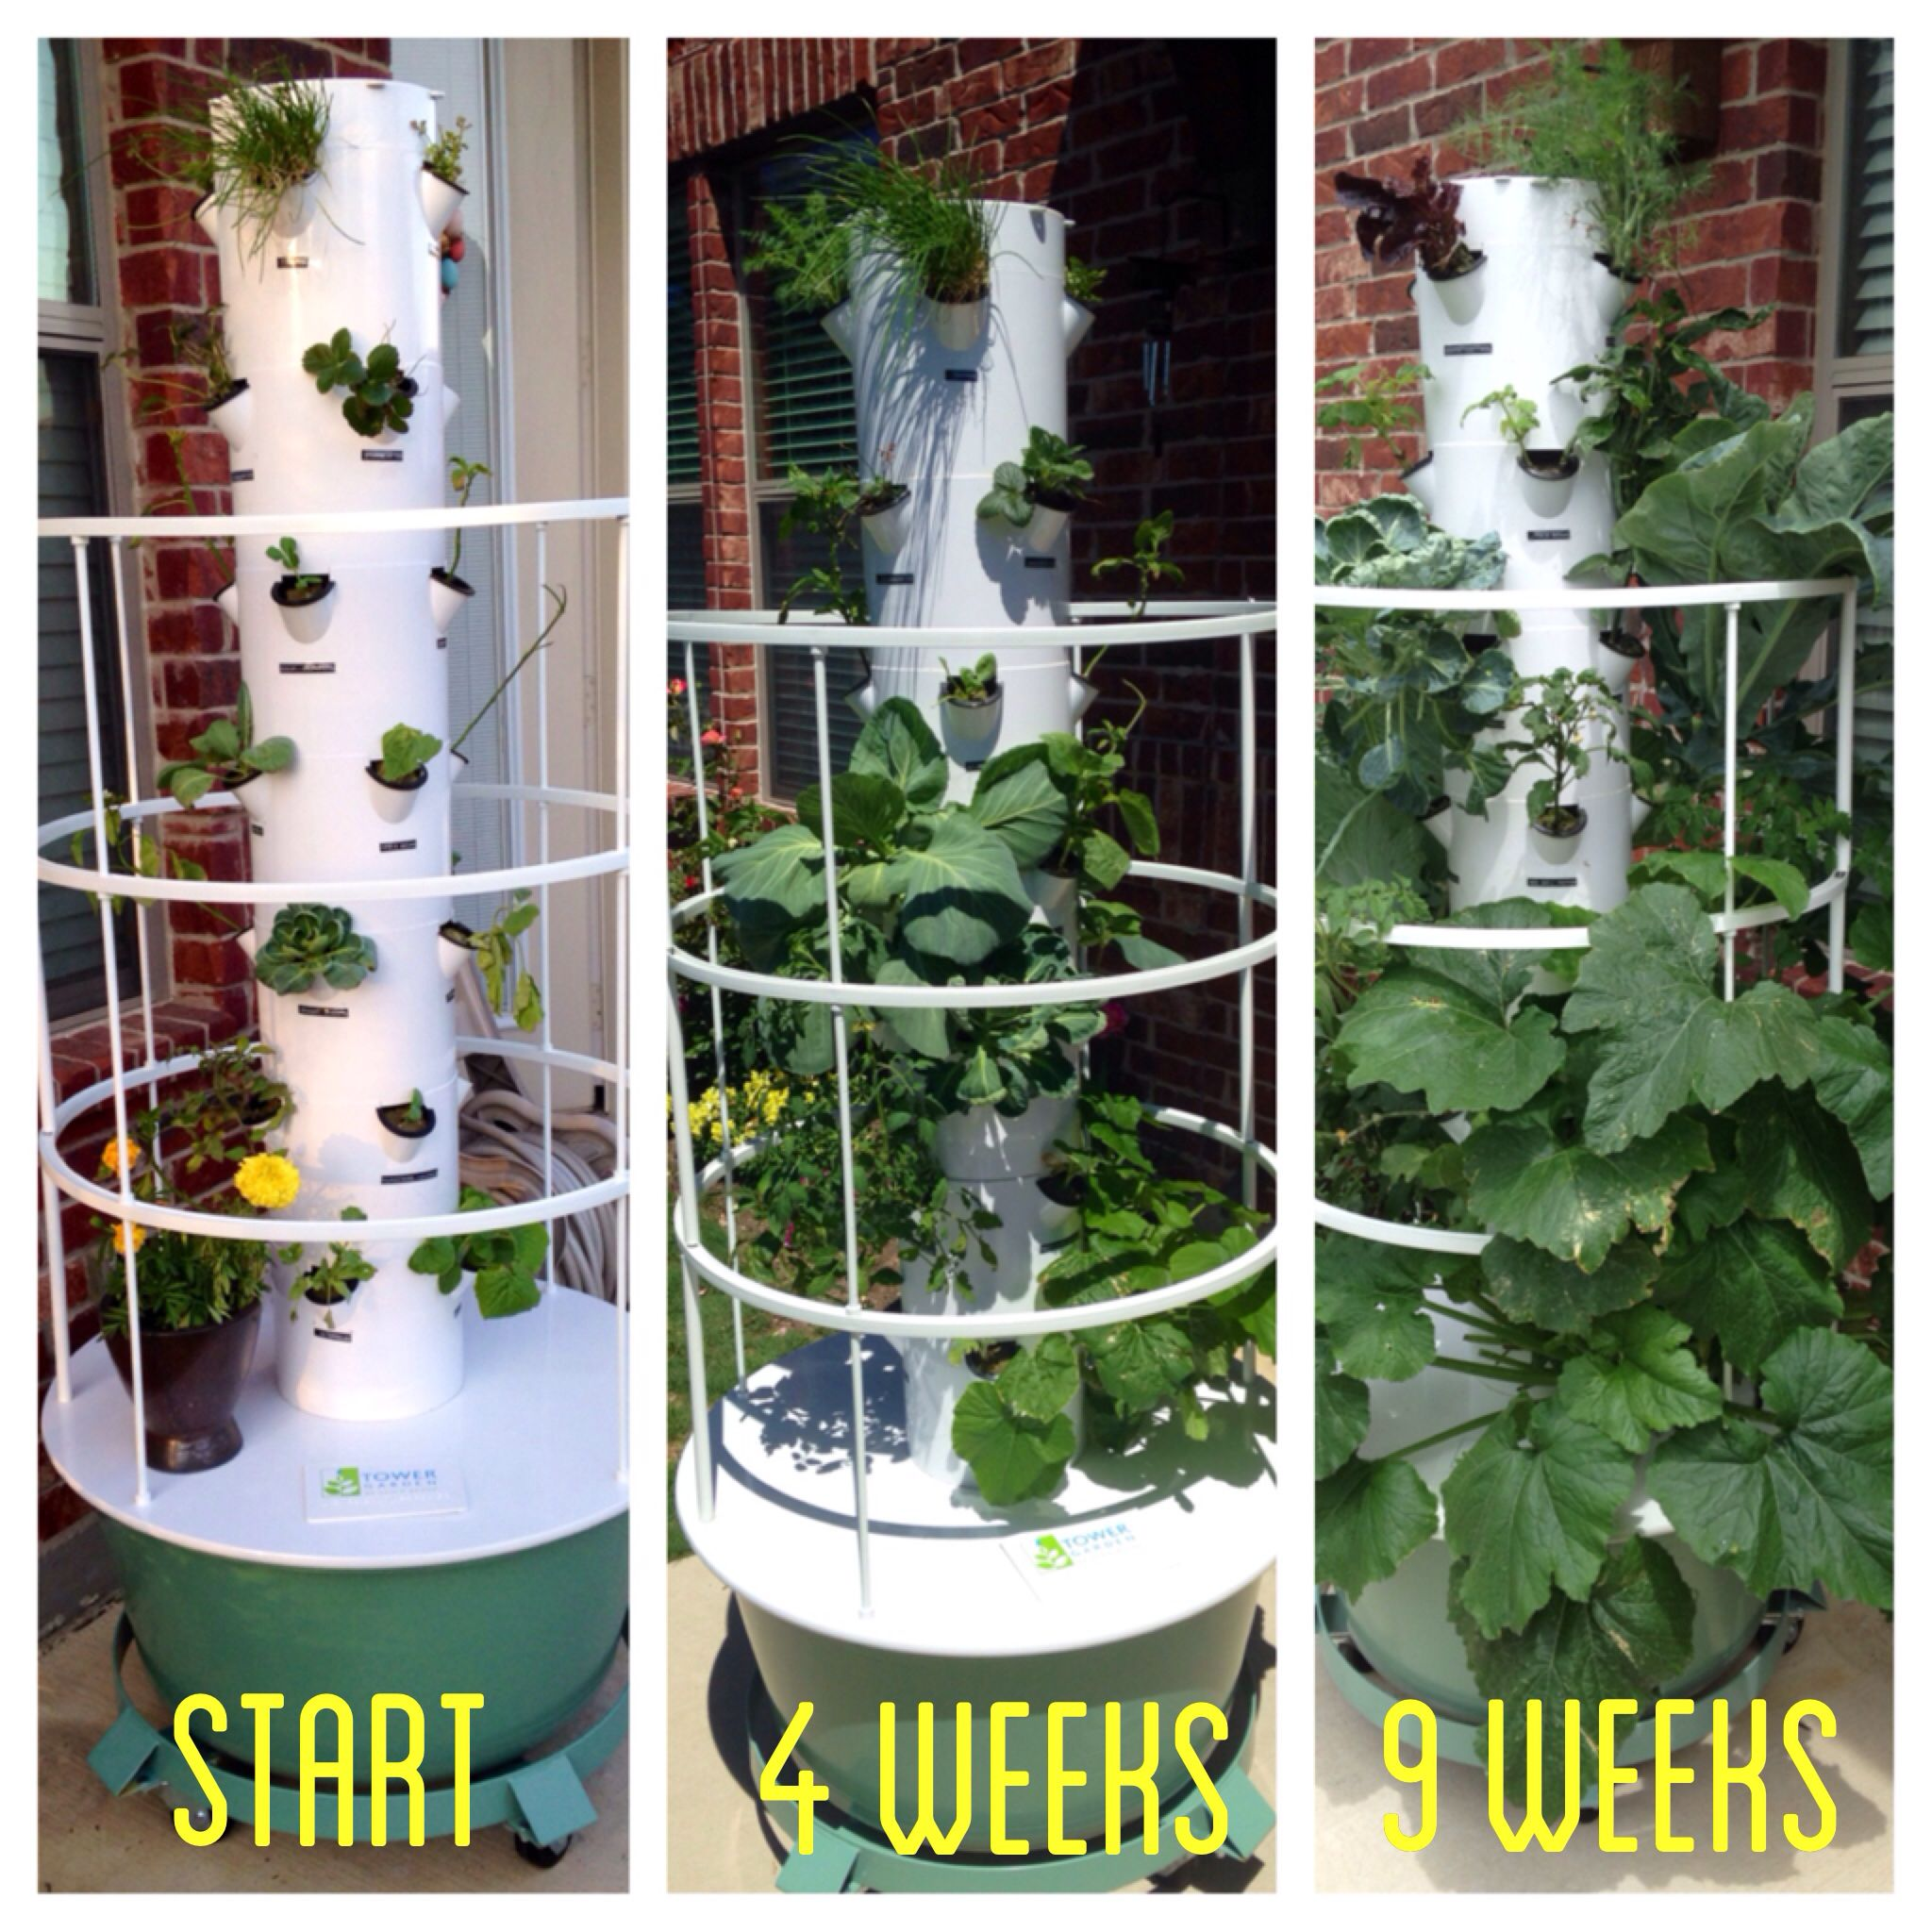 My Juice Plus Tower Garden Progress From Start To Nine Weeks Juiceplustowergarden Towergarden Growyourown Juice Plus Tower Garden Tower Garden Juice Plus